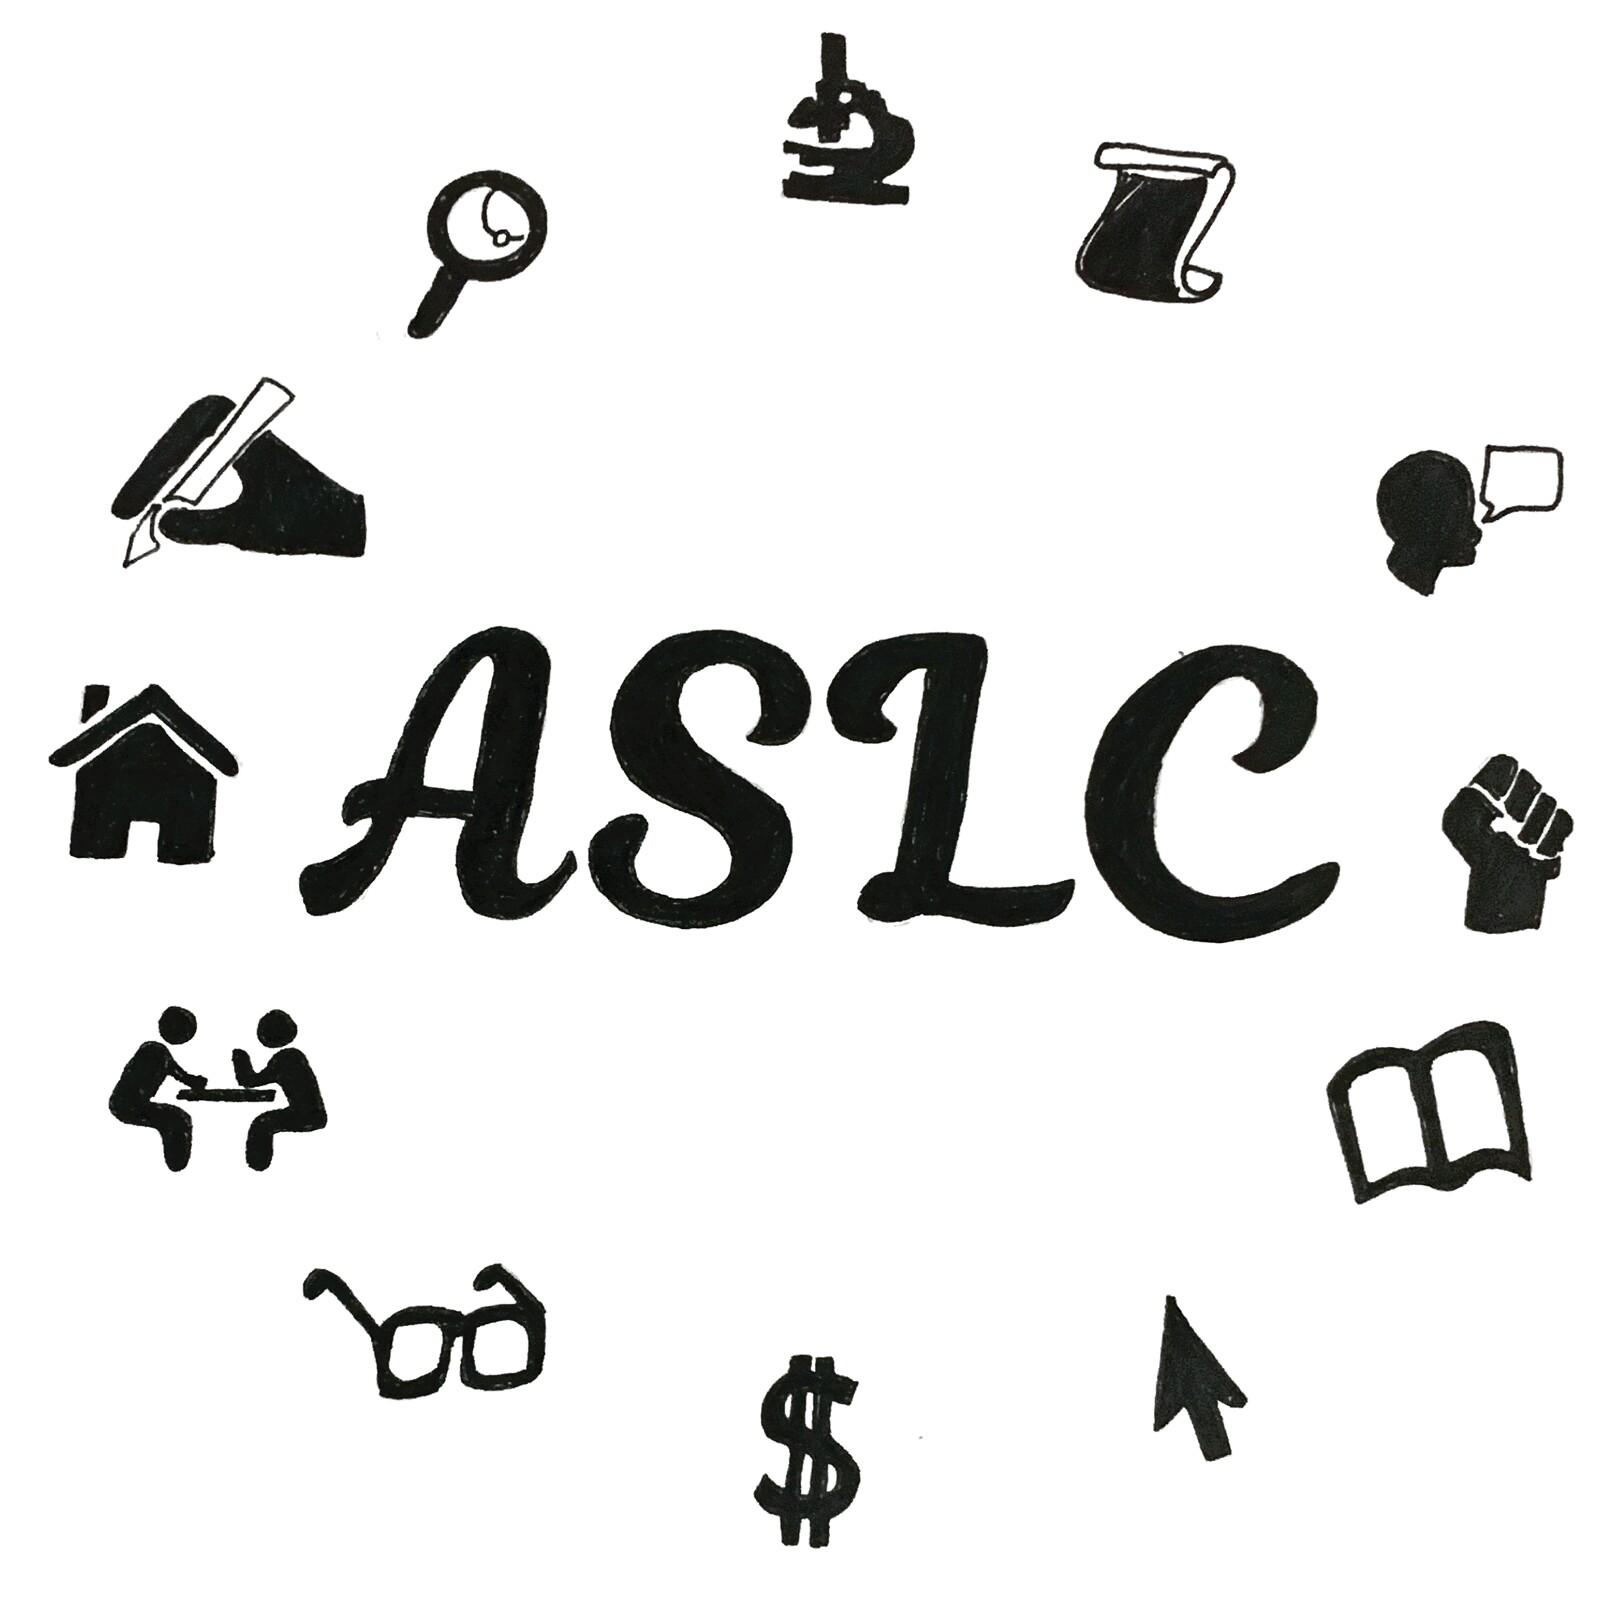 Aslc Update Senate Challenges New Student Storage